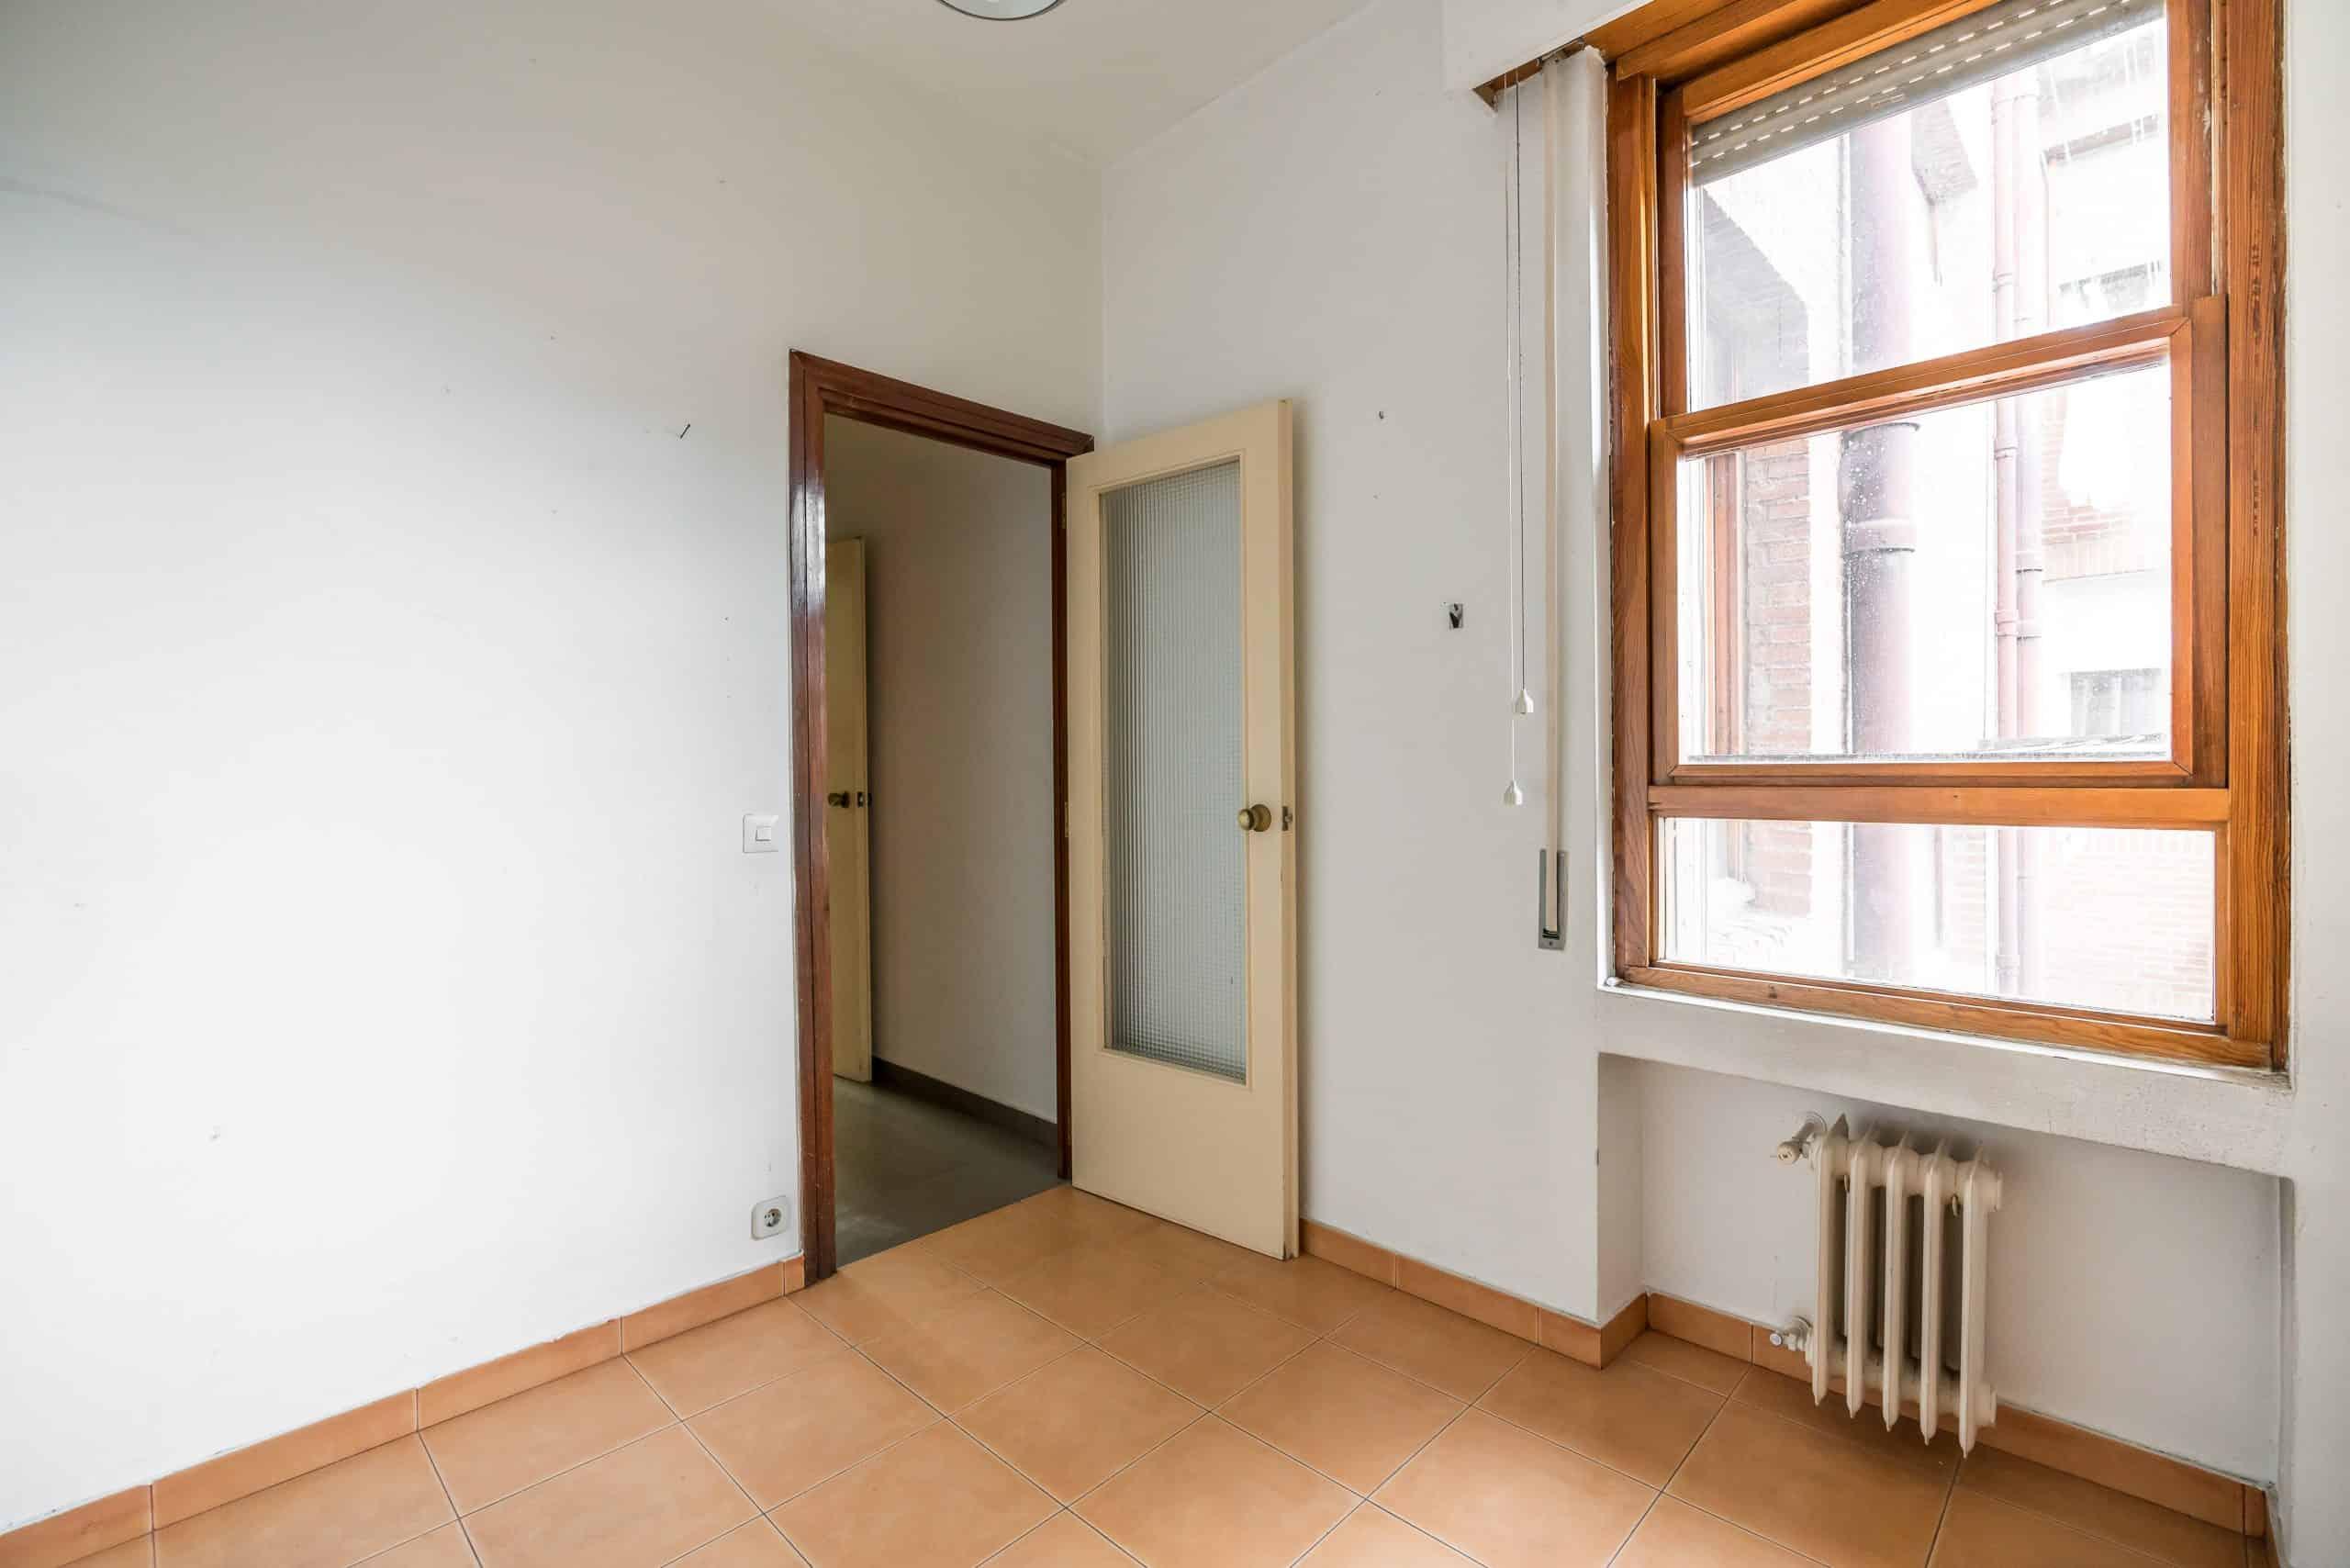 Agencia Inmobiliaria de Madrid-FUTUROCASA-Zona ARGANZUELA-EMBAJADORES-LEGAZPI -calle Embajadores- baño 150